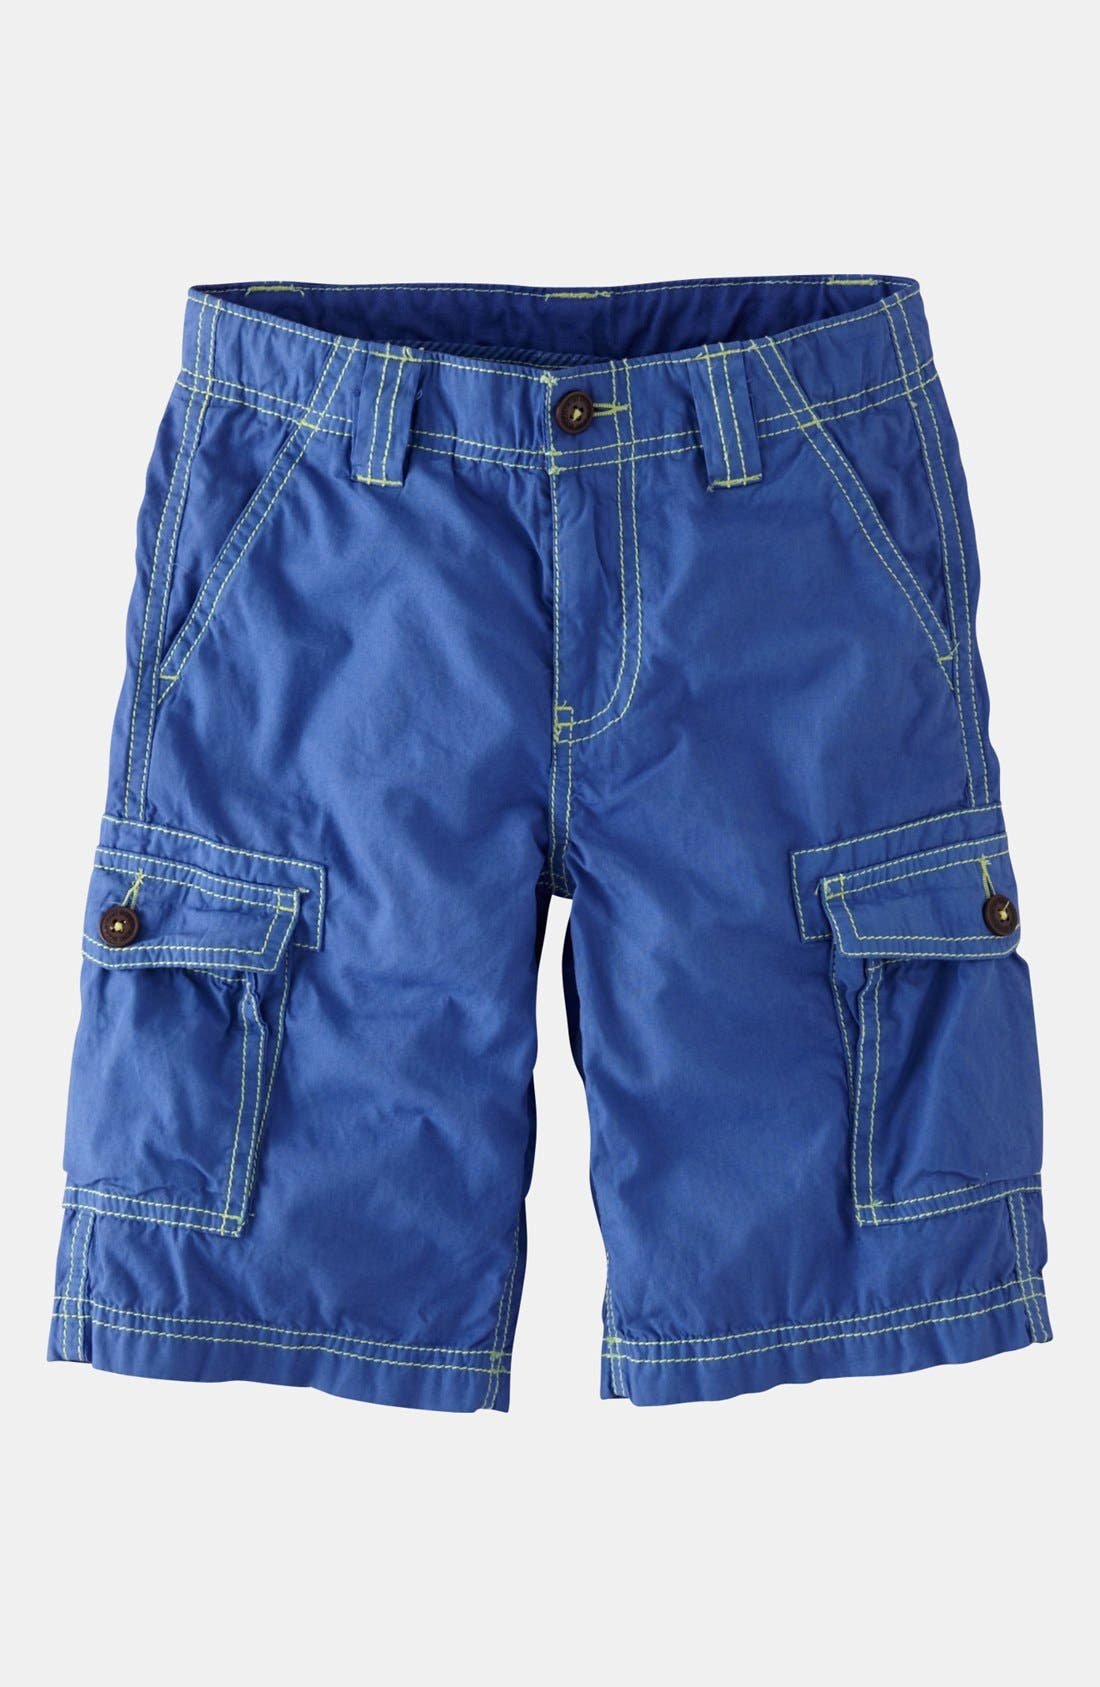 Alternate Image 1 Selected - Mini Boden Cargo Shorts (Toddler, Little Boys & Big Boys)